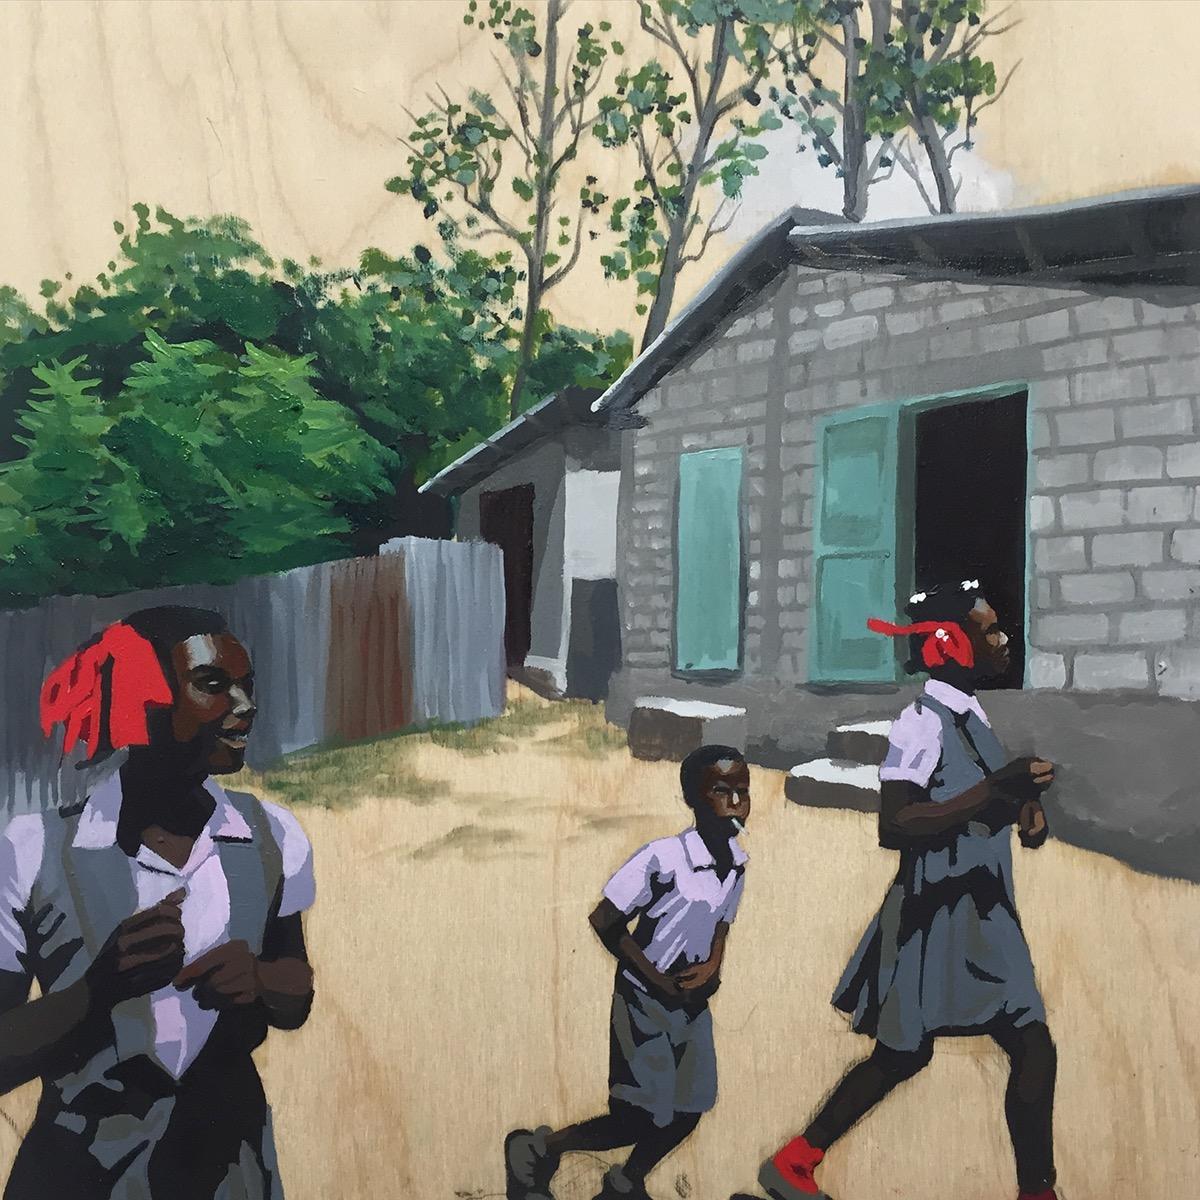 Haiti haitians GraffitiAbstract lettering